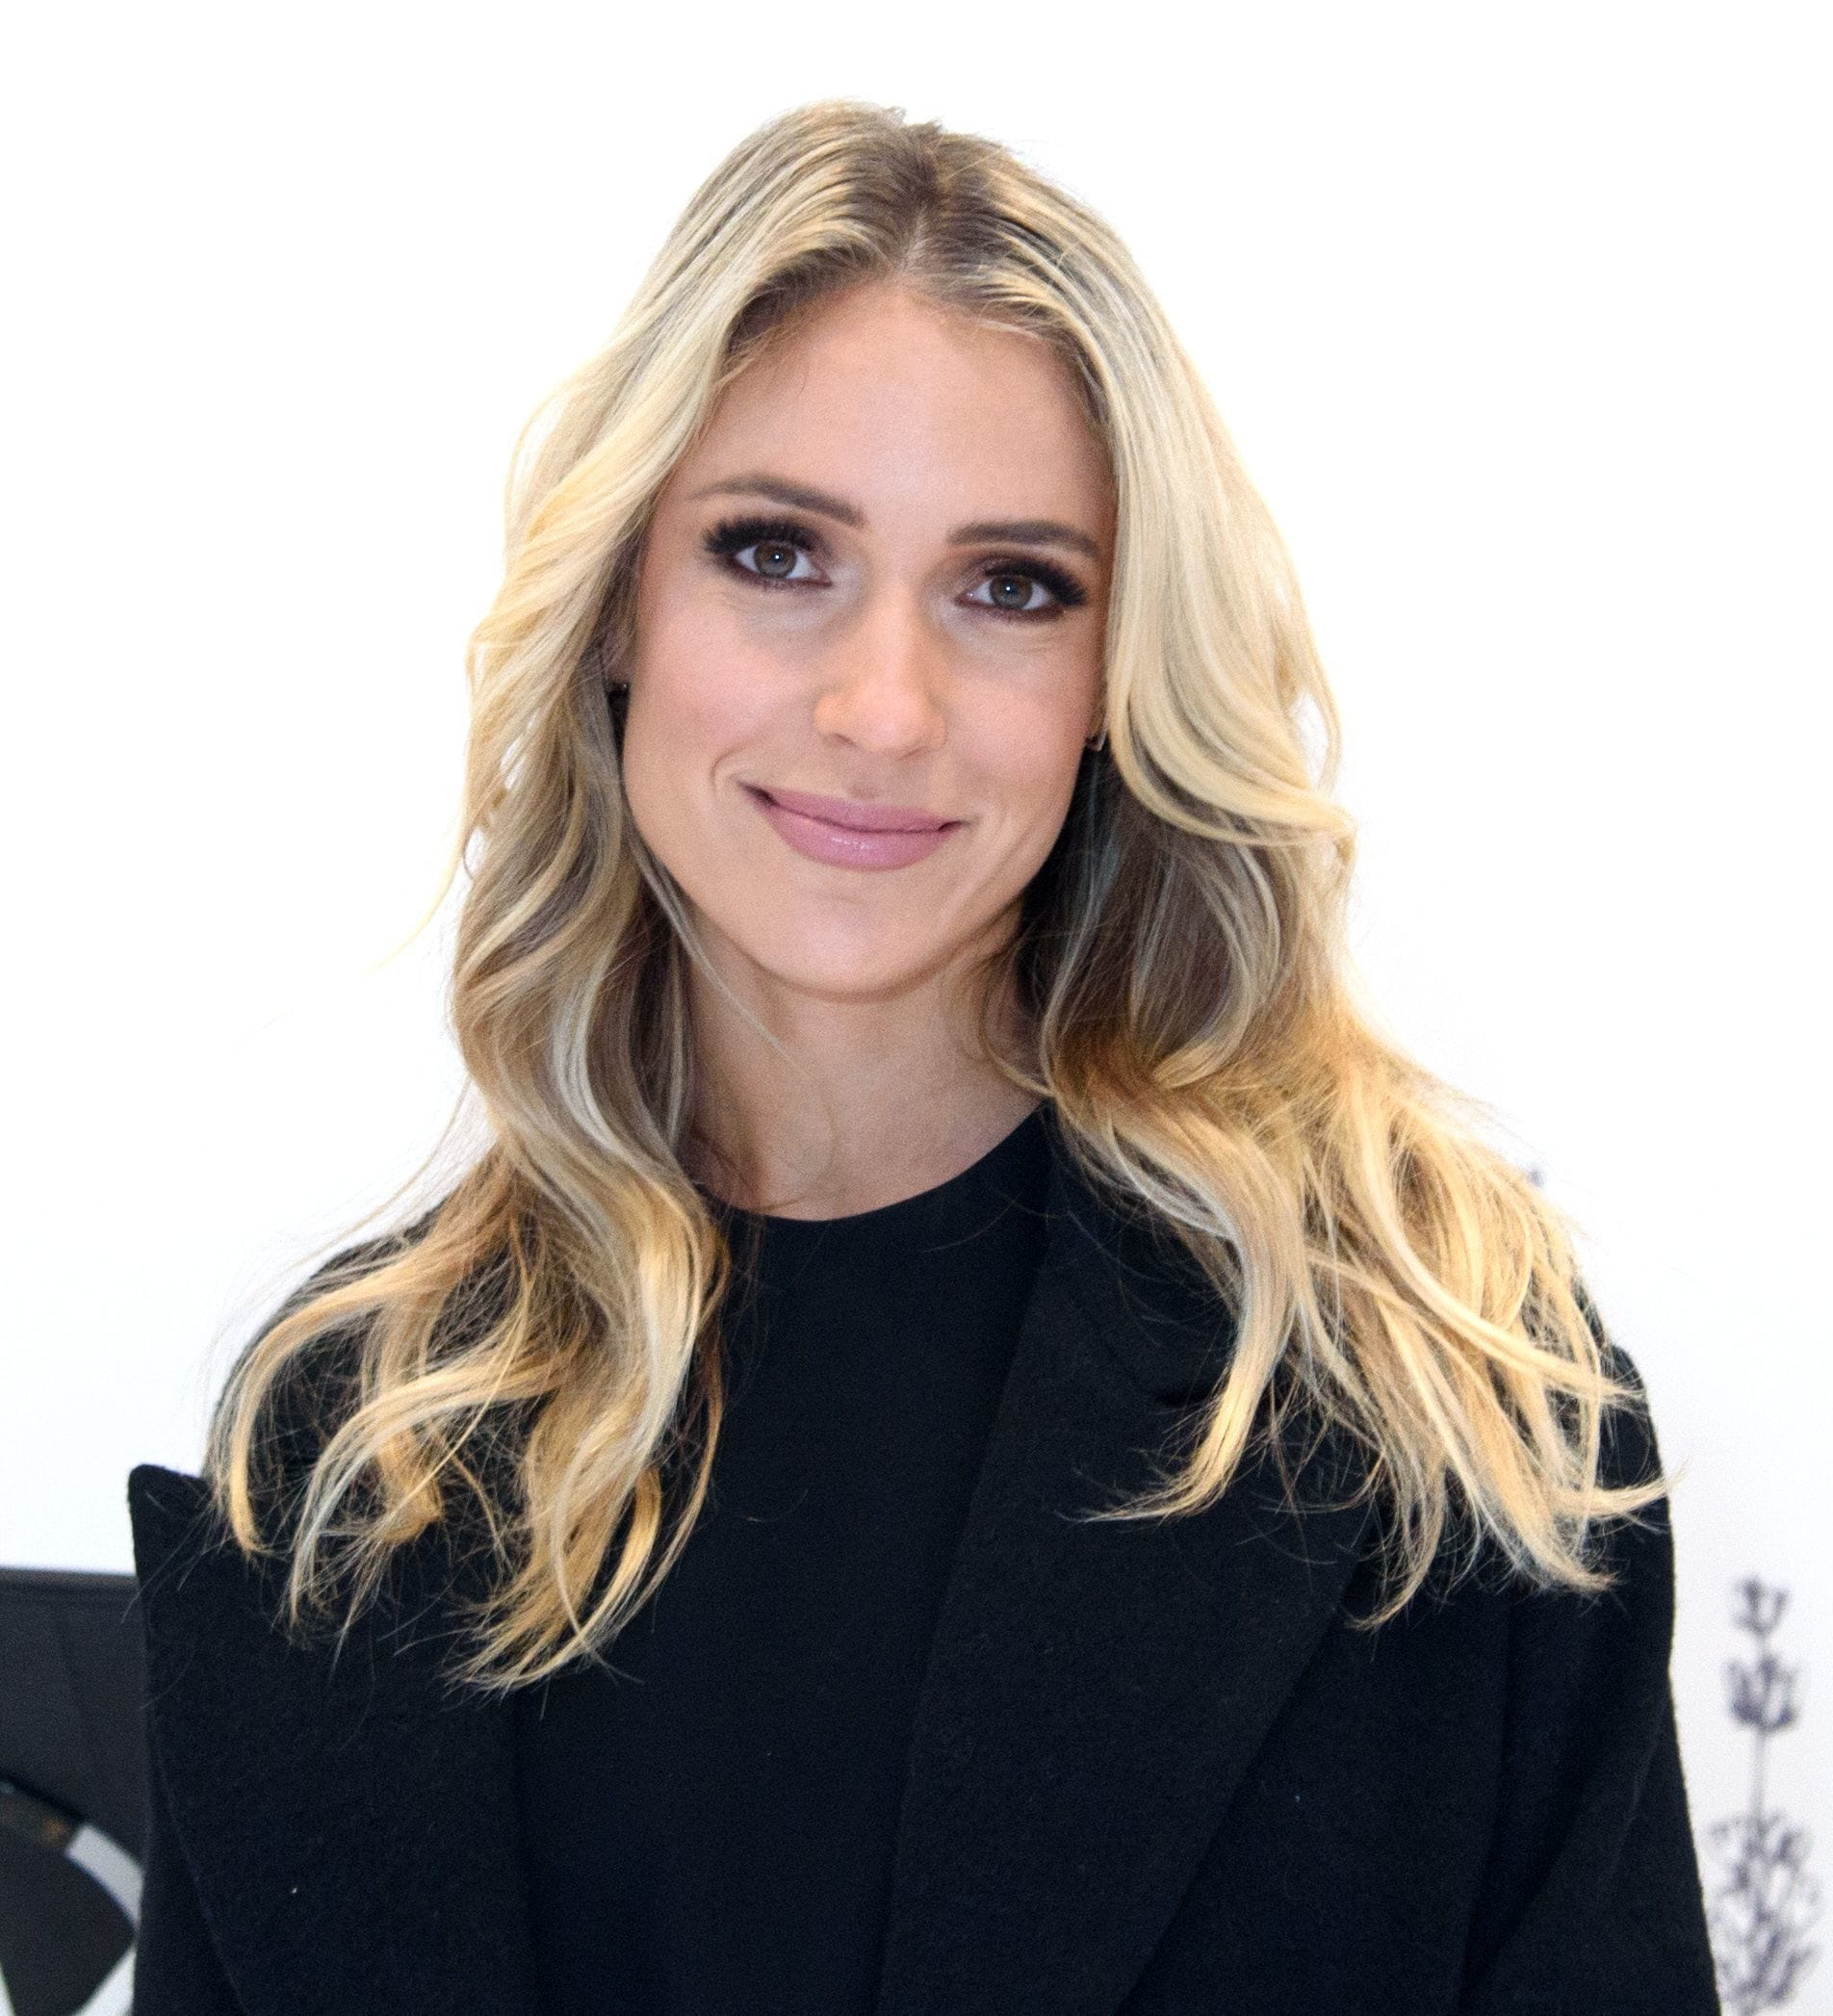 Kristin Cavallari's New Cut Is Giving Laguna Beach Fans Serious In Kristin Cavallari Short Hairstyles (View 20 of 25)